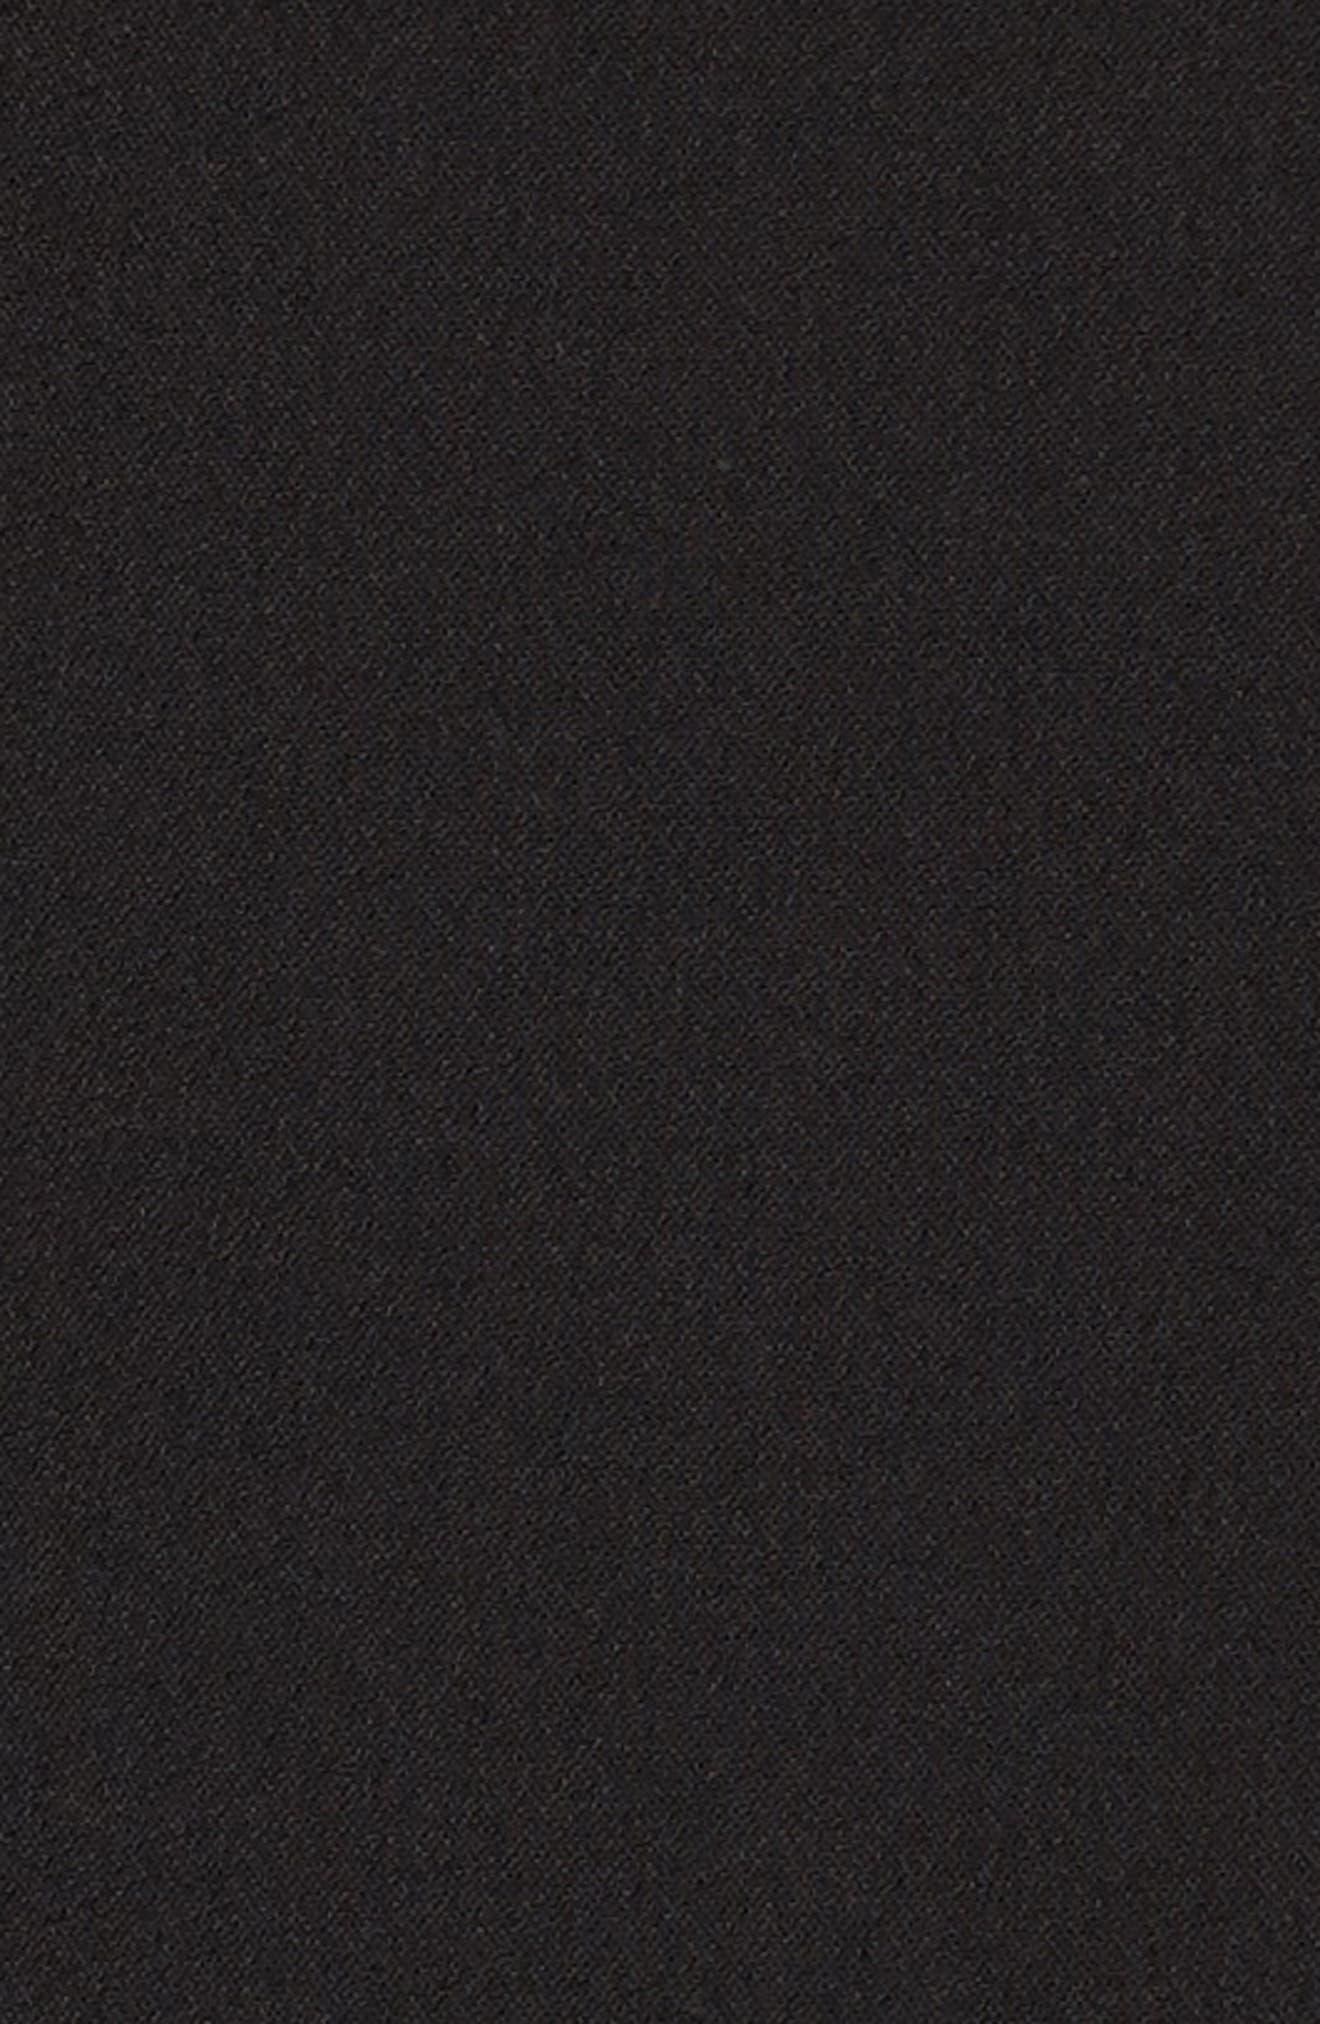 Orlando Ruffle Sleeve Dress,                             Alternate thumbnail 5, color,                             Black